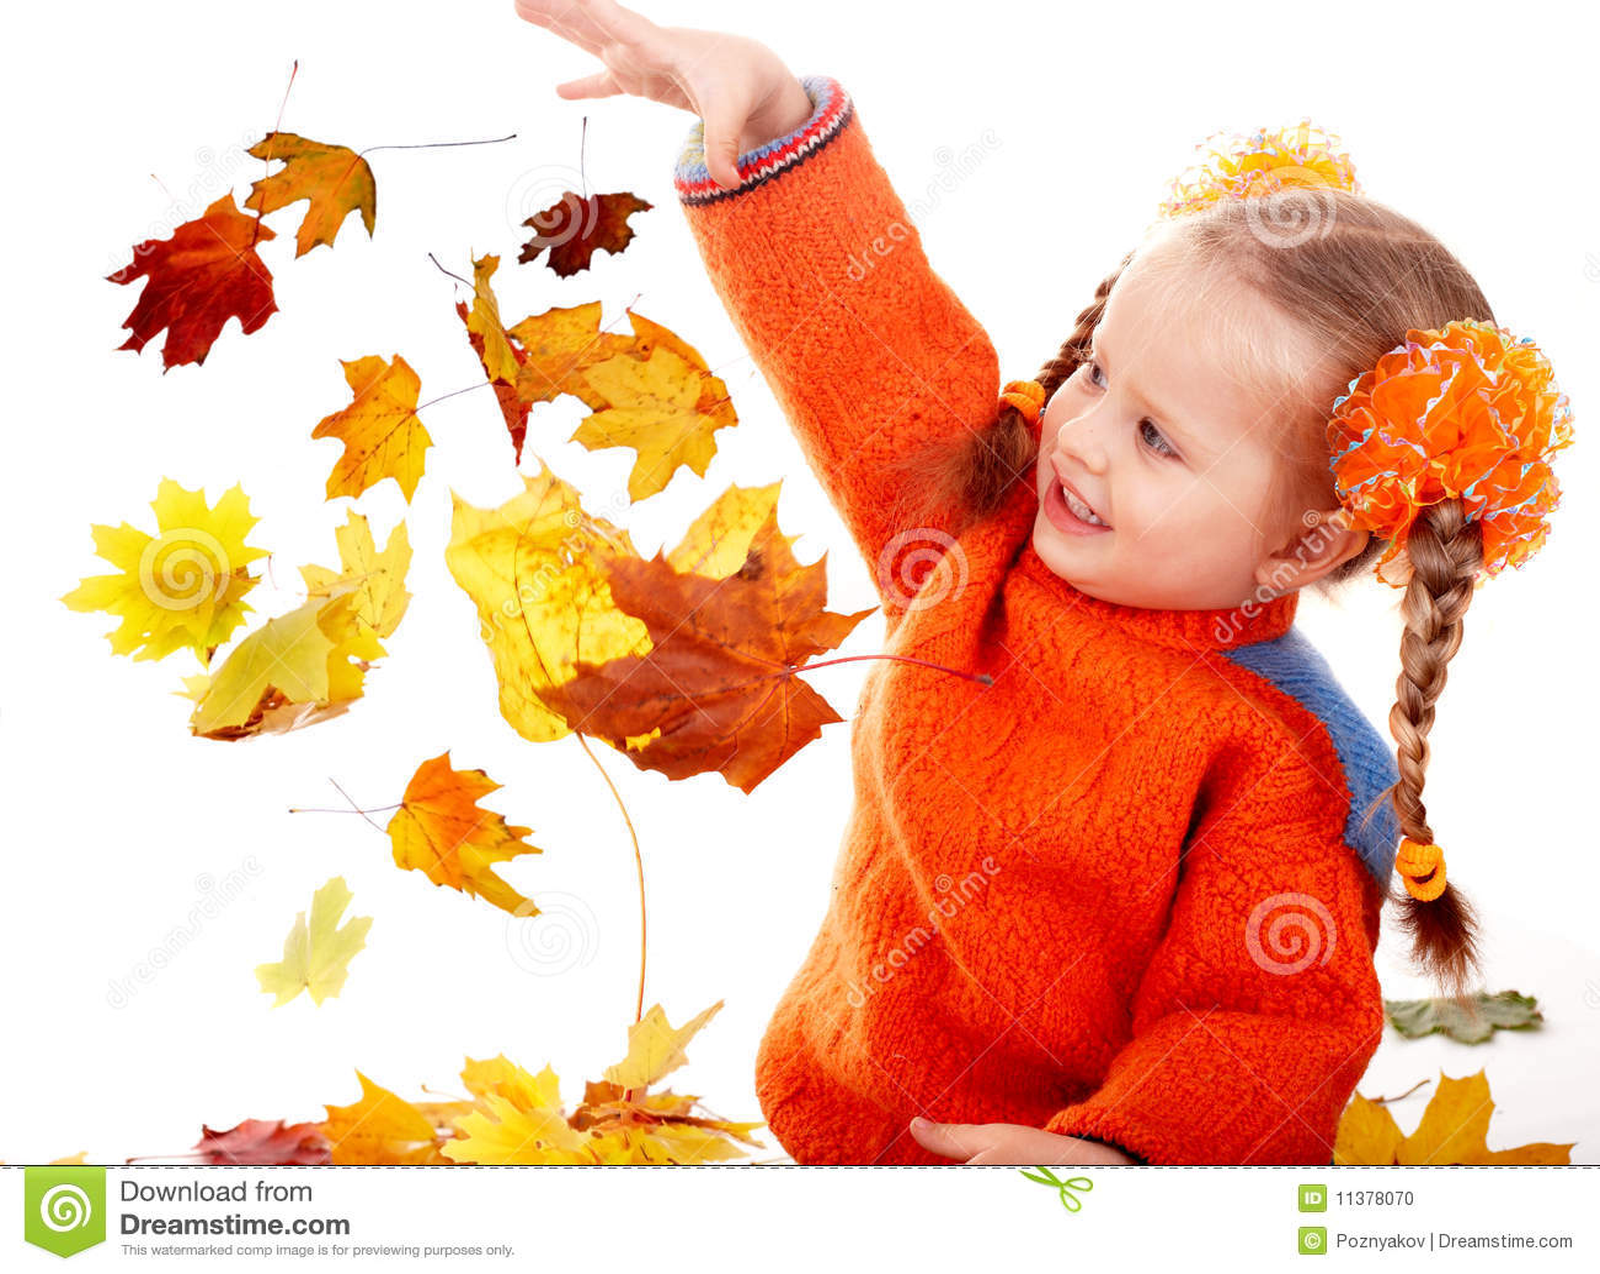 Girl child in autumn orange leaves. Fall sale.